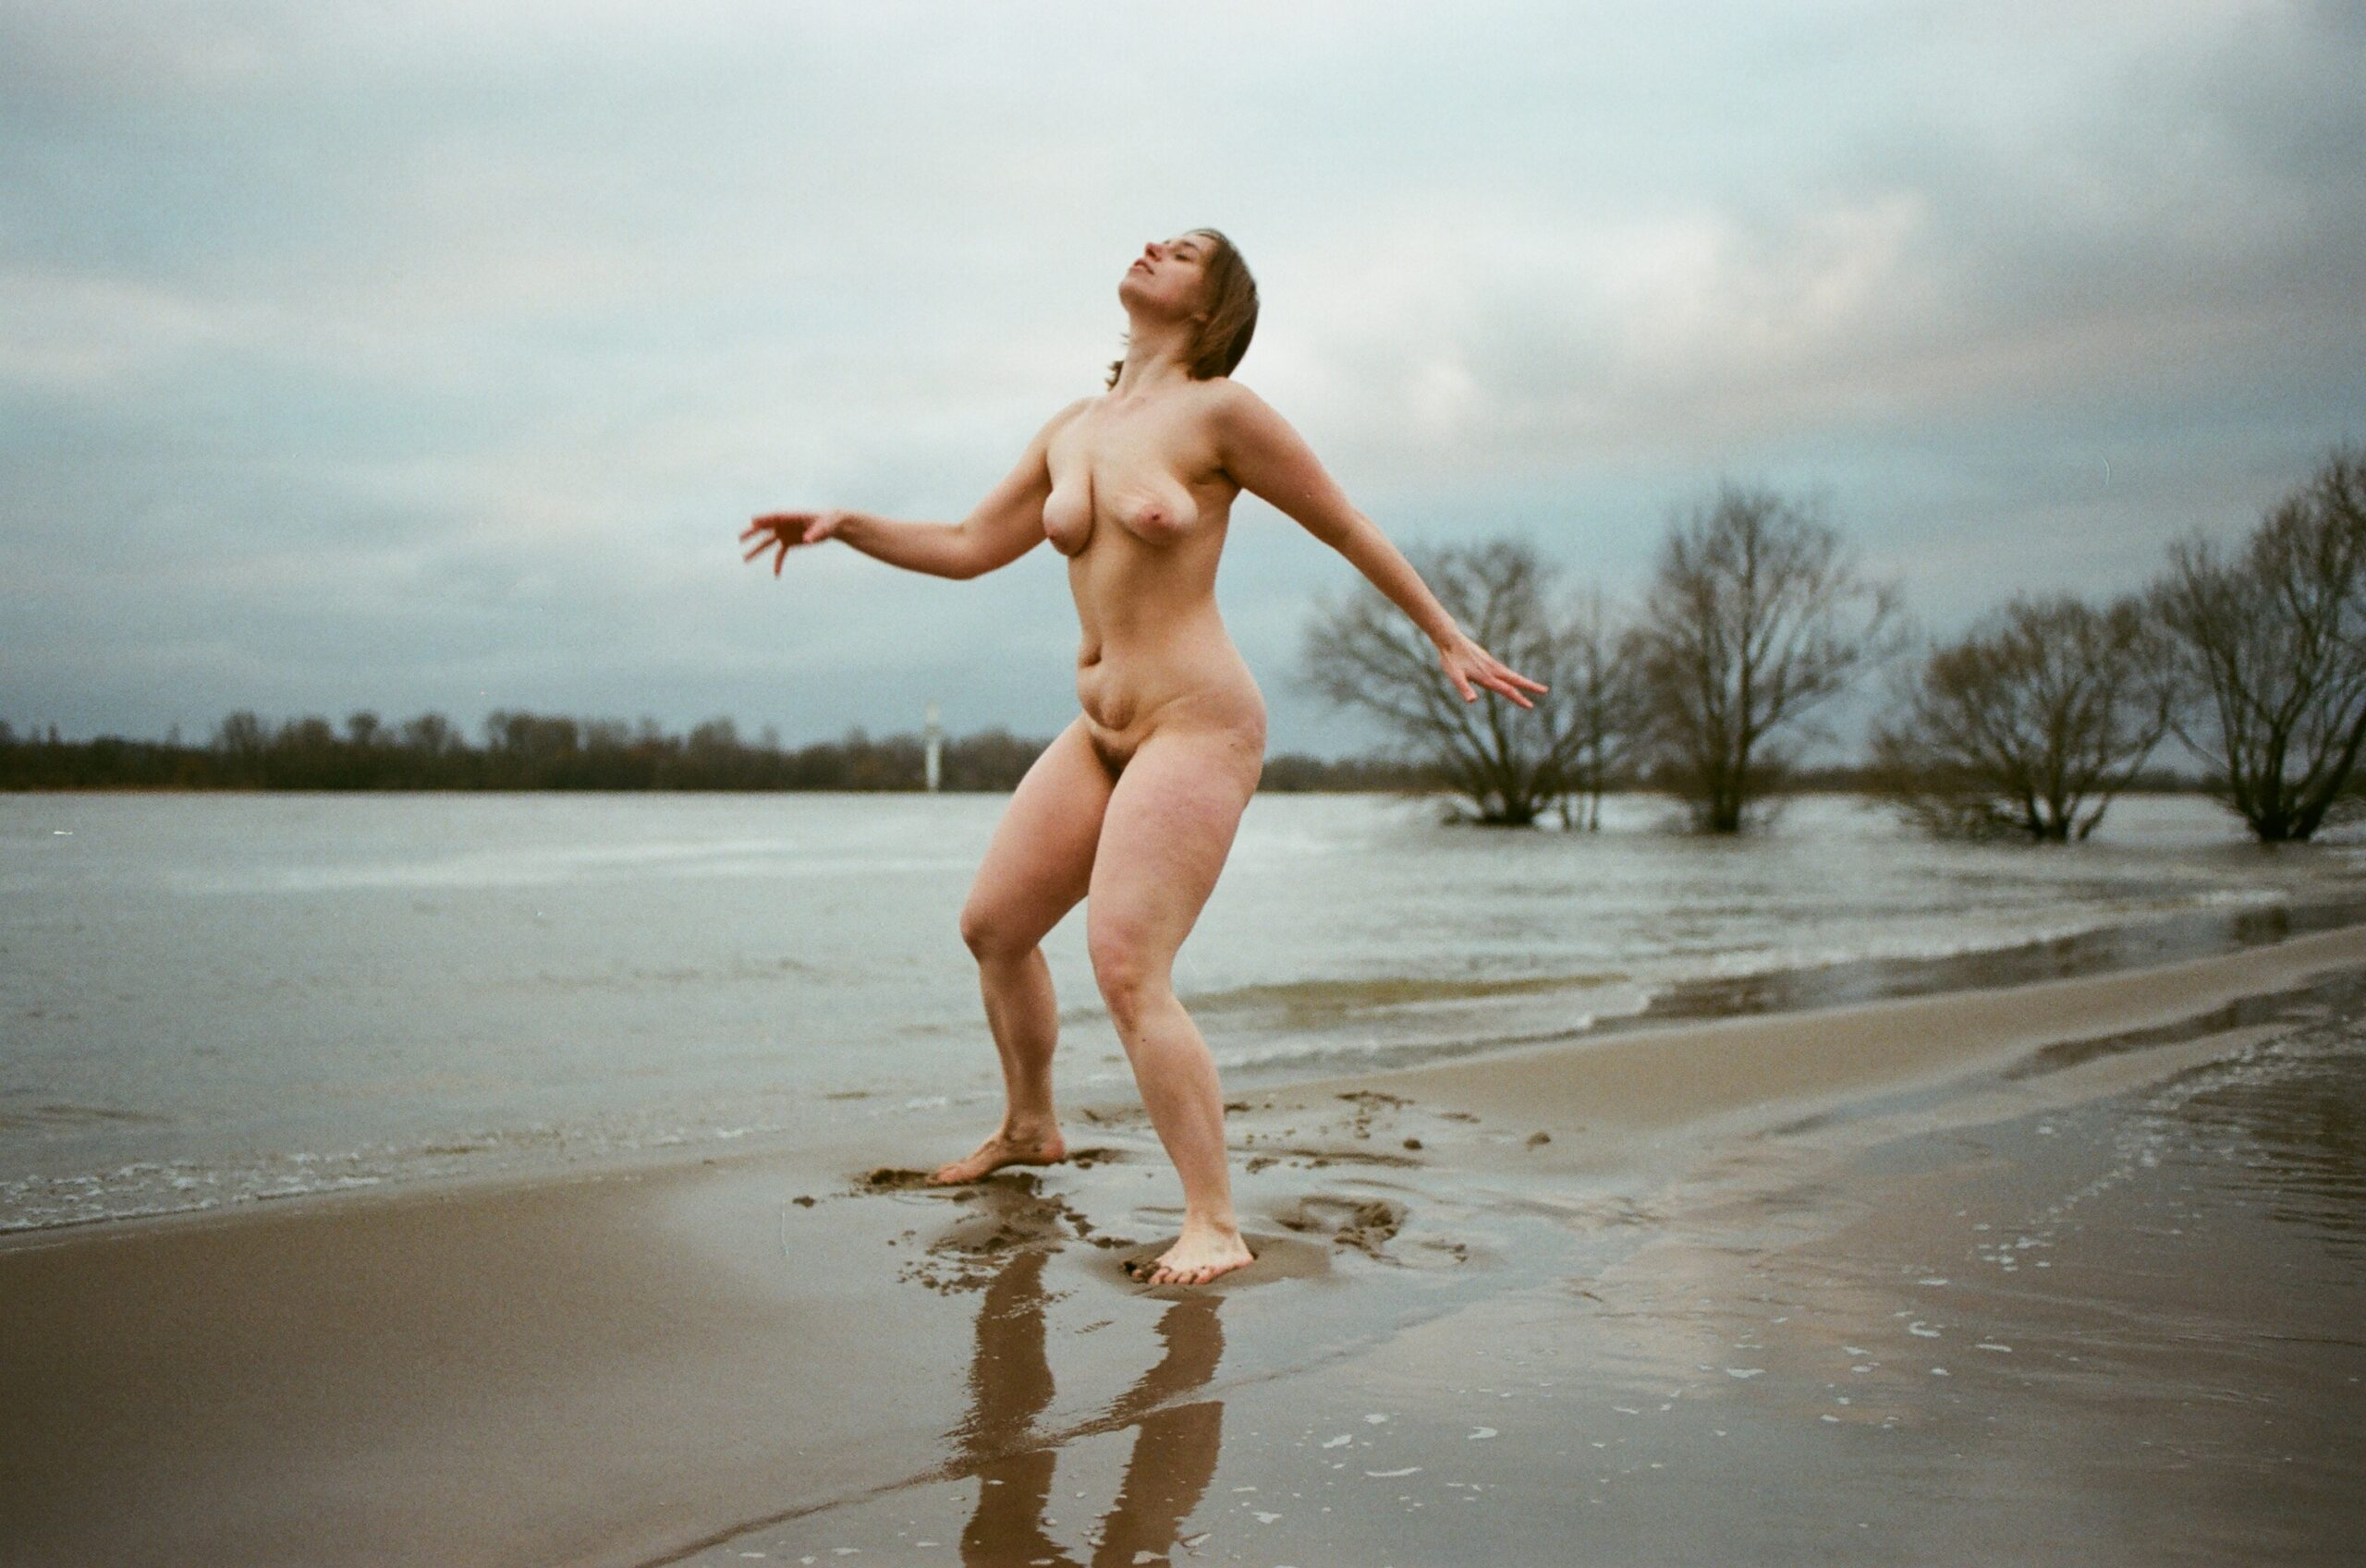 © Lisa Strautmann 2021